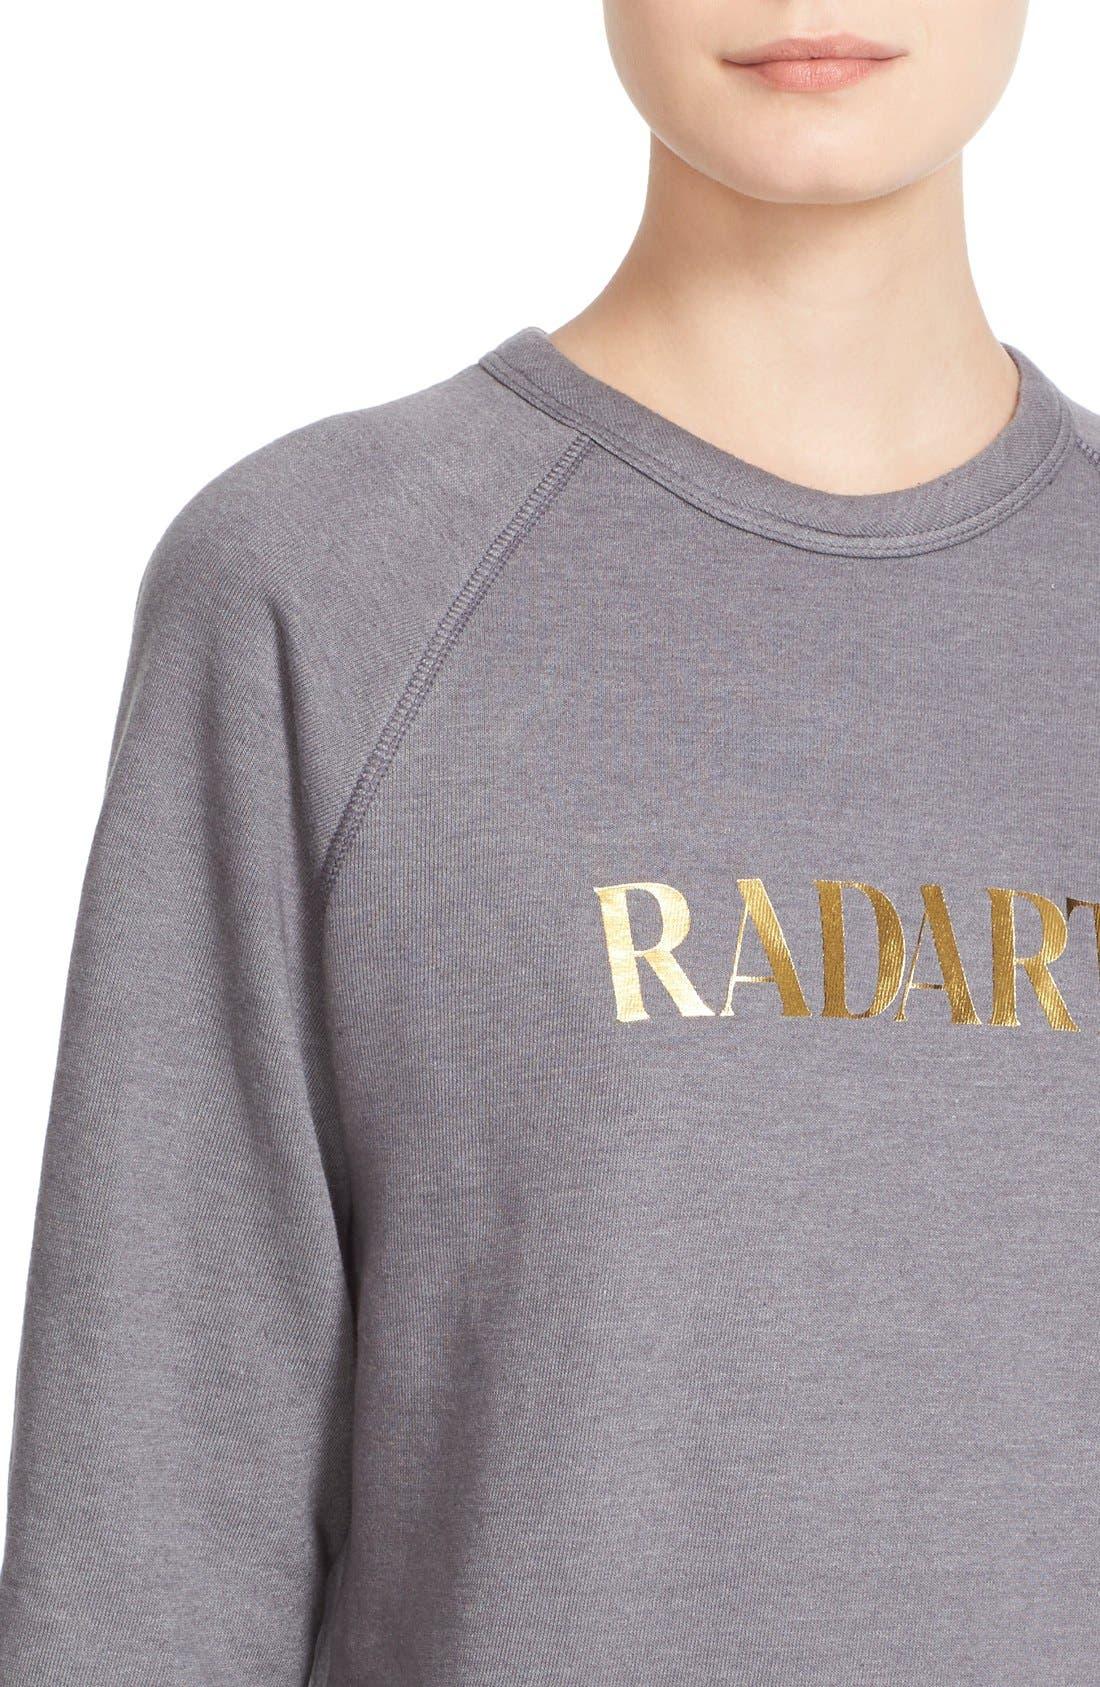 'Radarte' Foil Sweatshirt,                             Alternate thumbnail 2, color,                             022